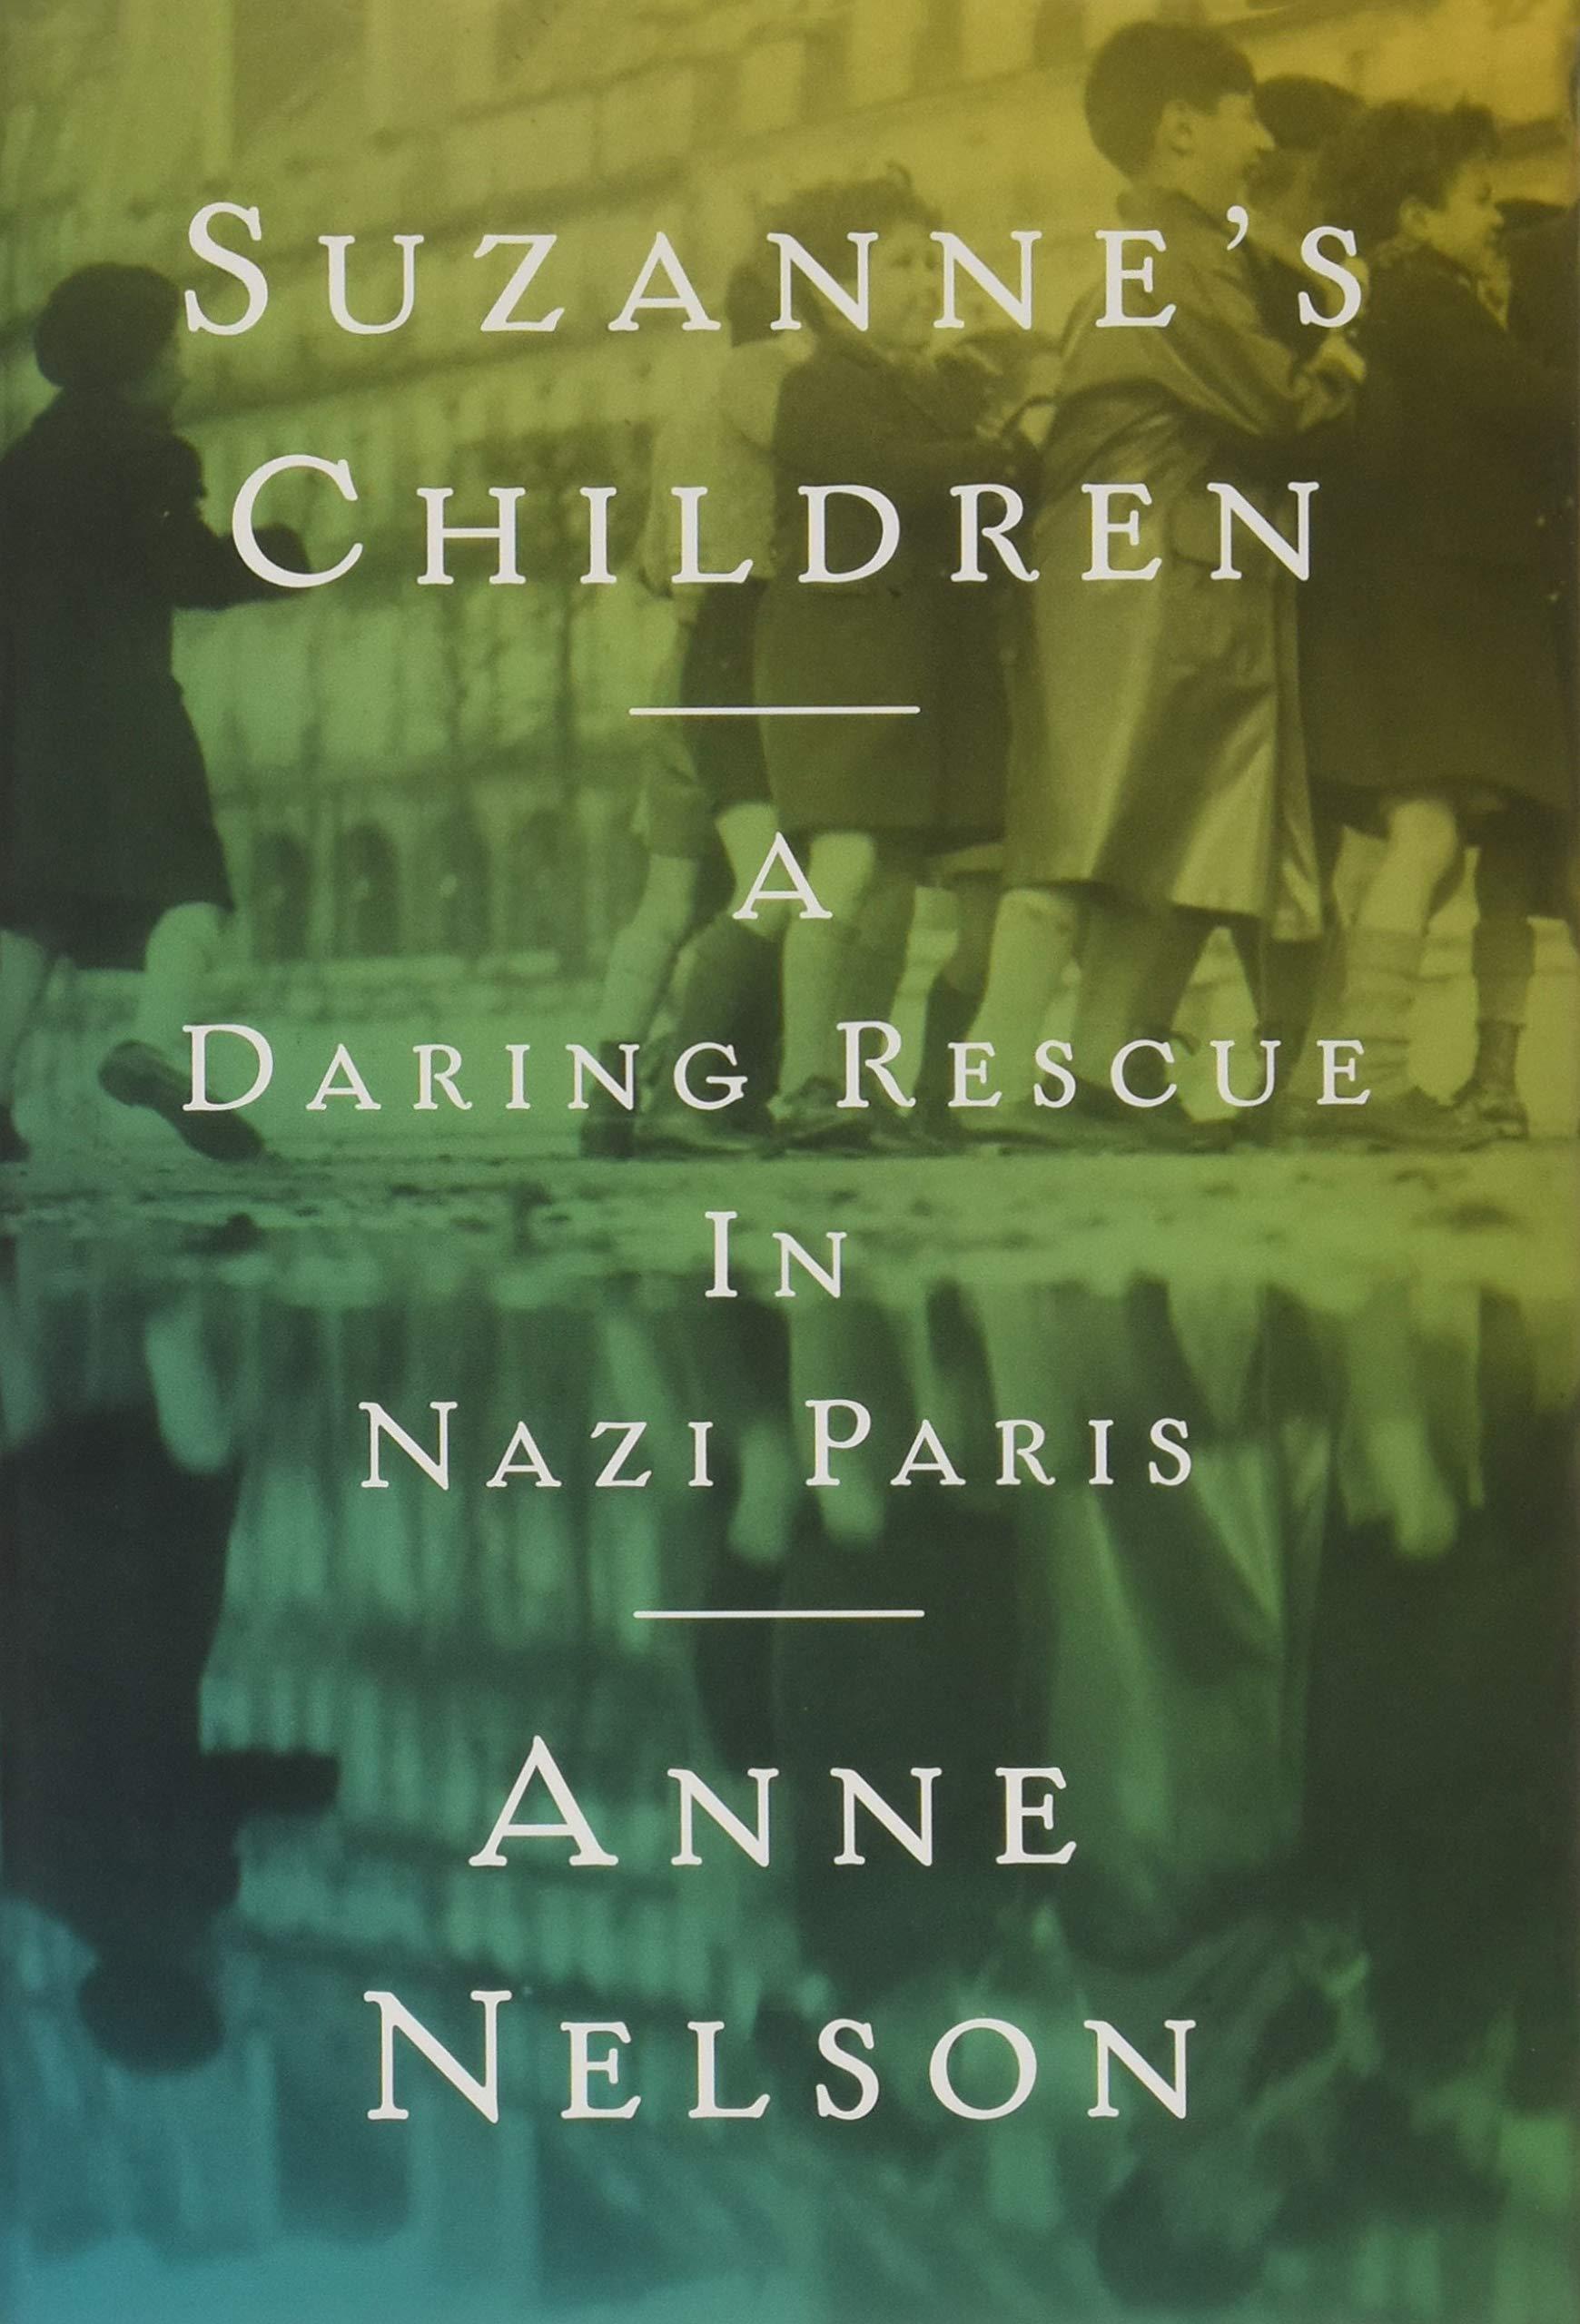 UNITED STATES WWII NAZI BOOK BURNING PROPAGANDA POSTER REAL CANVASART PRINT